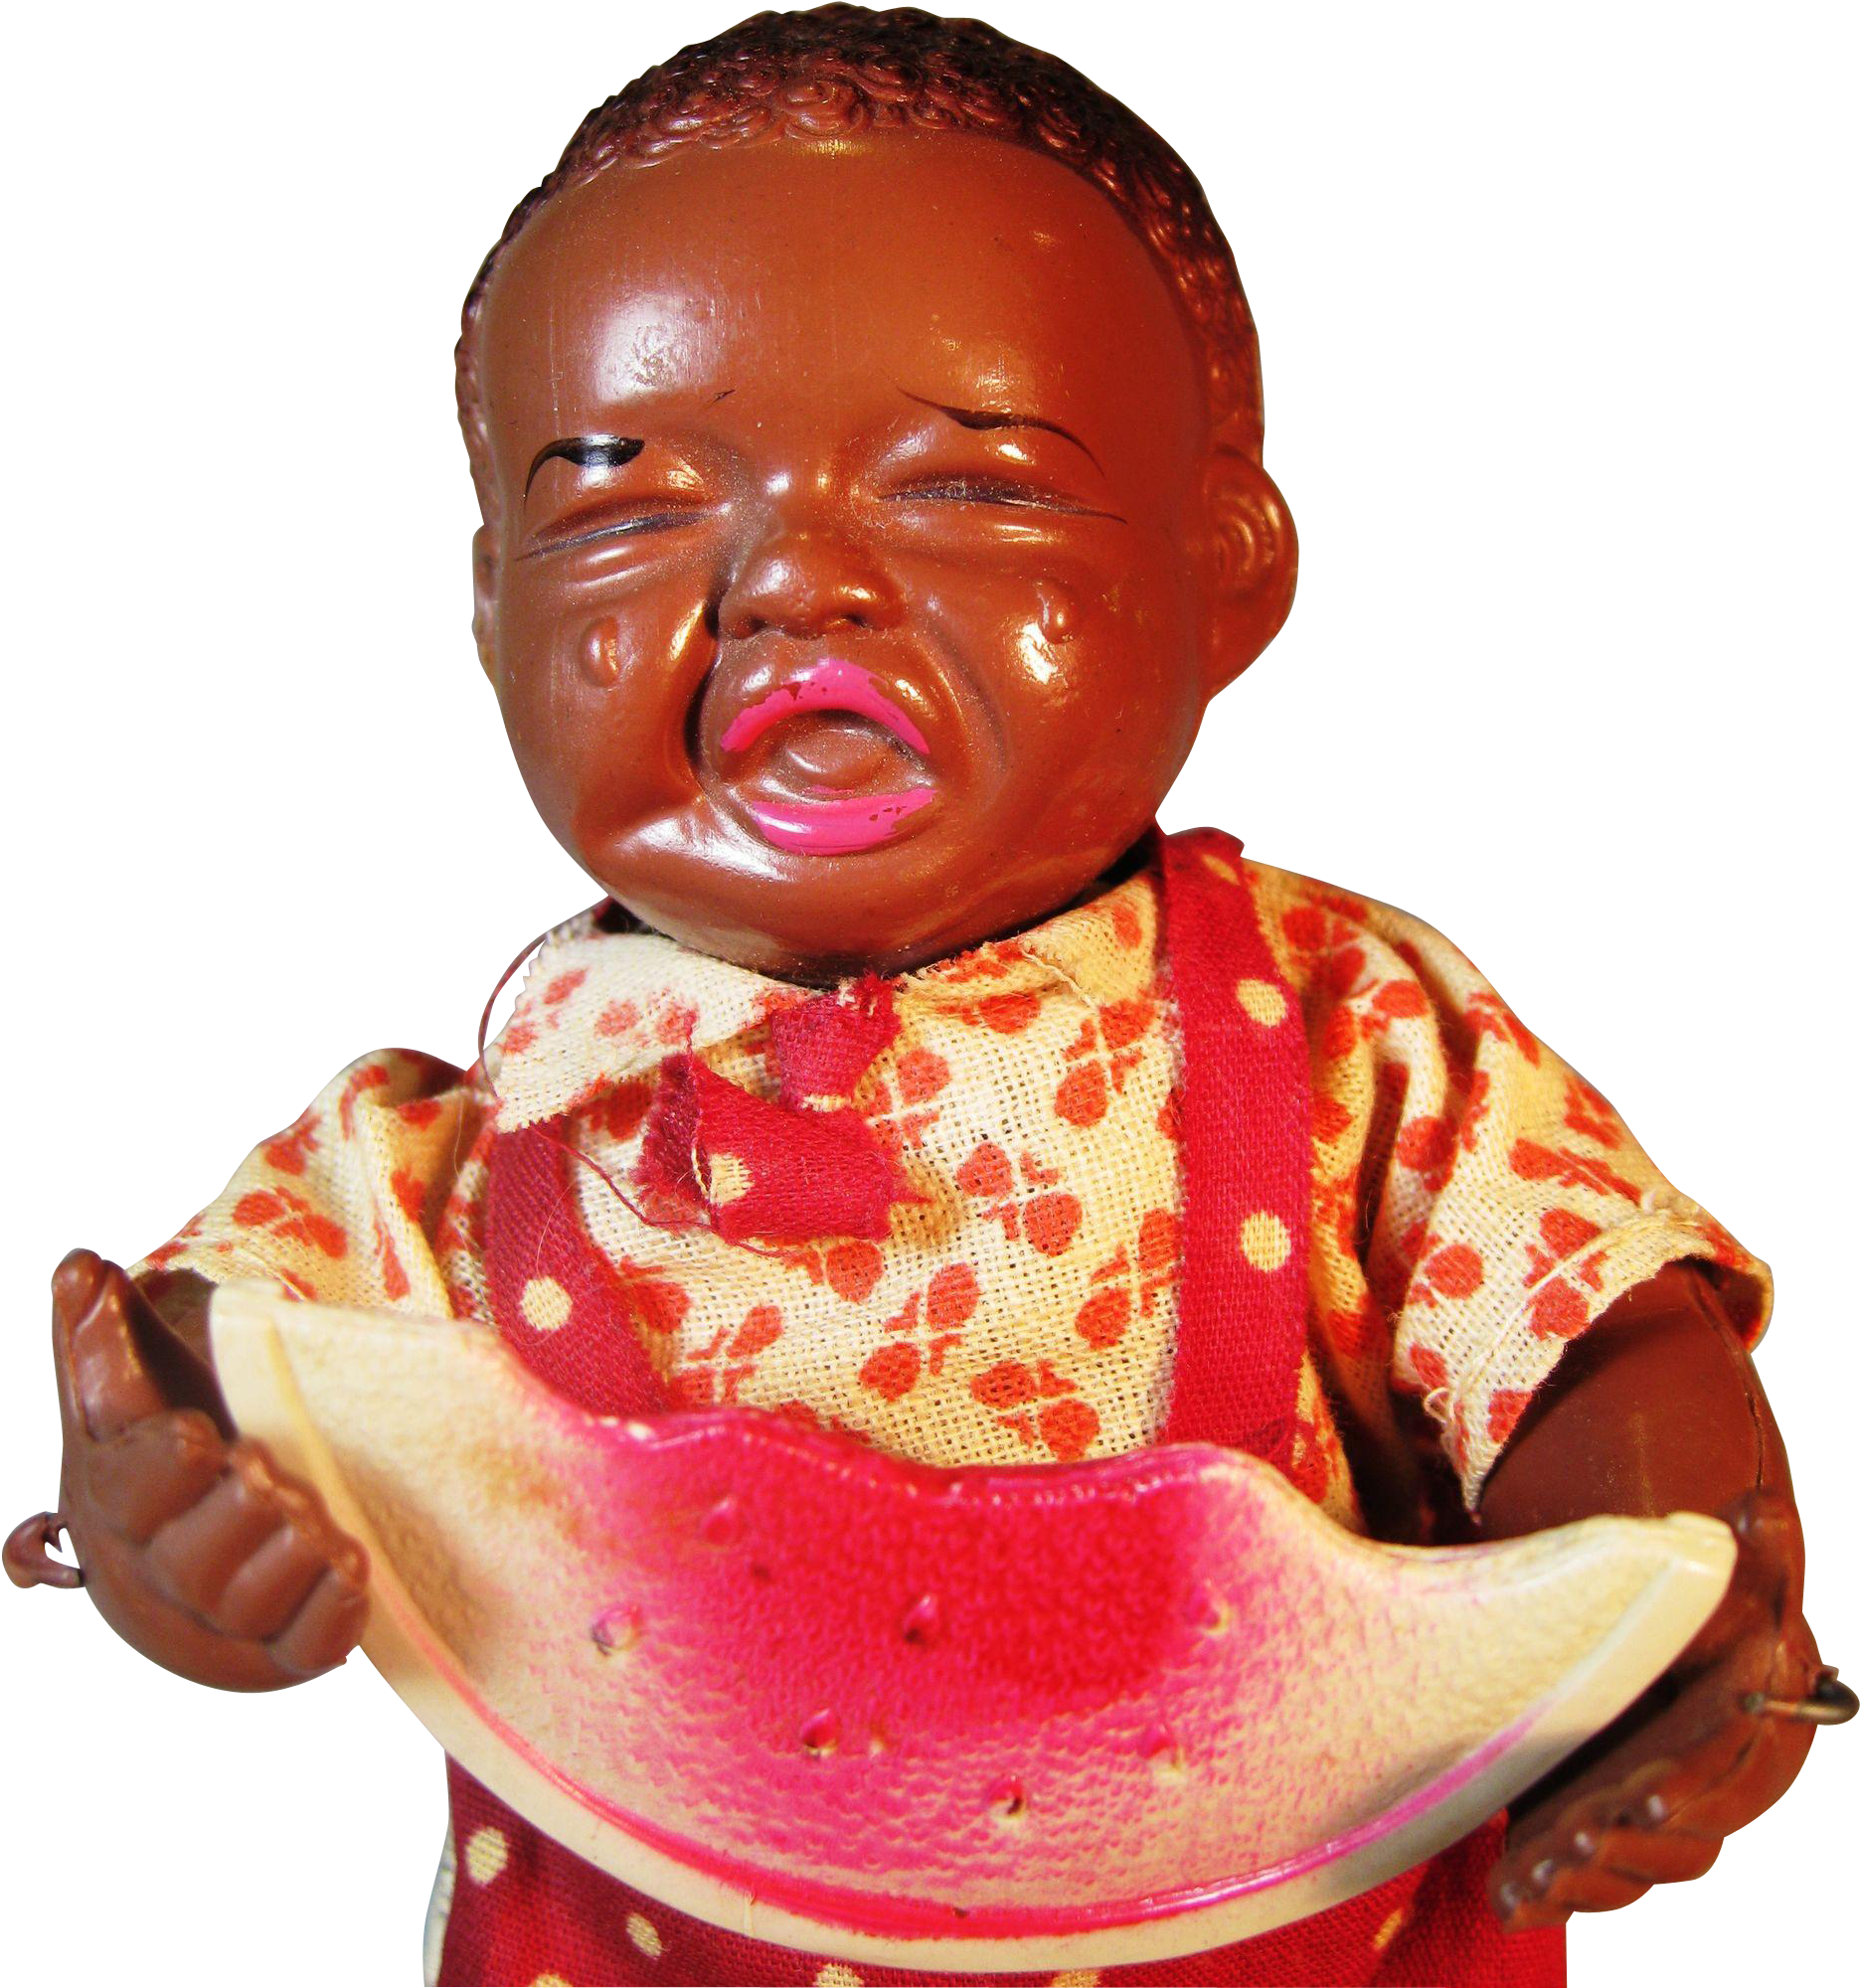 African American Newborn Baby Girl.